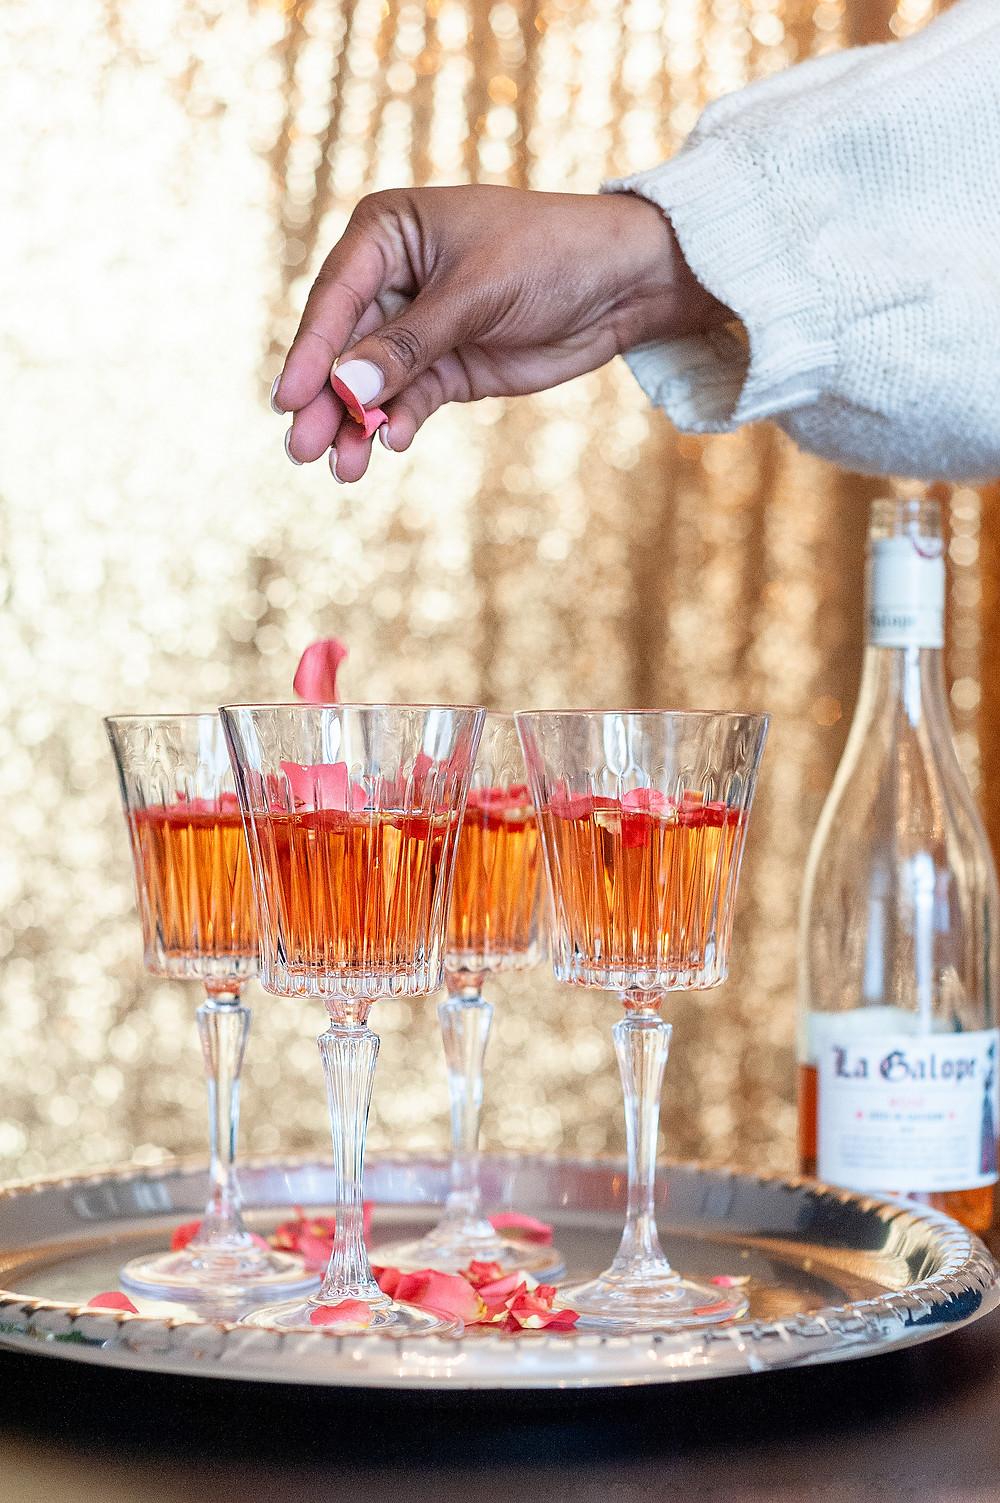 Fancy cocktails and petals